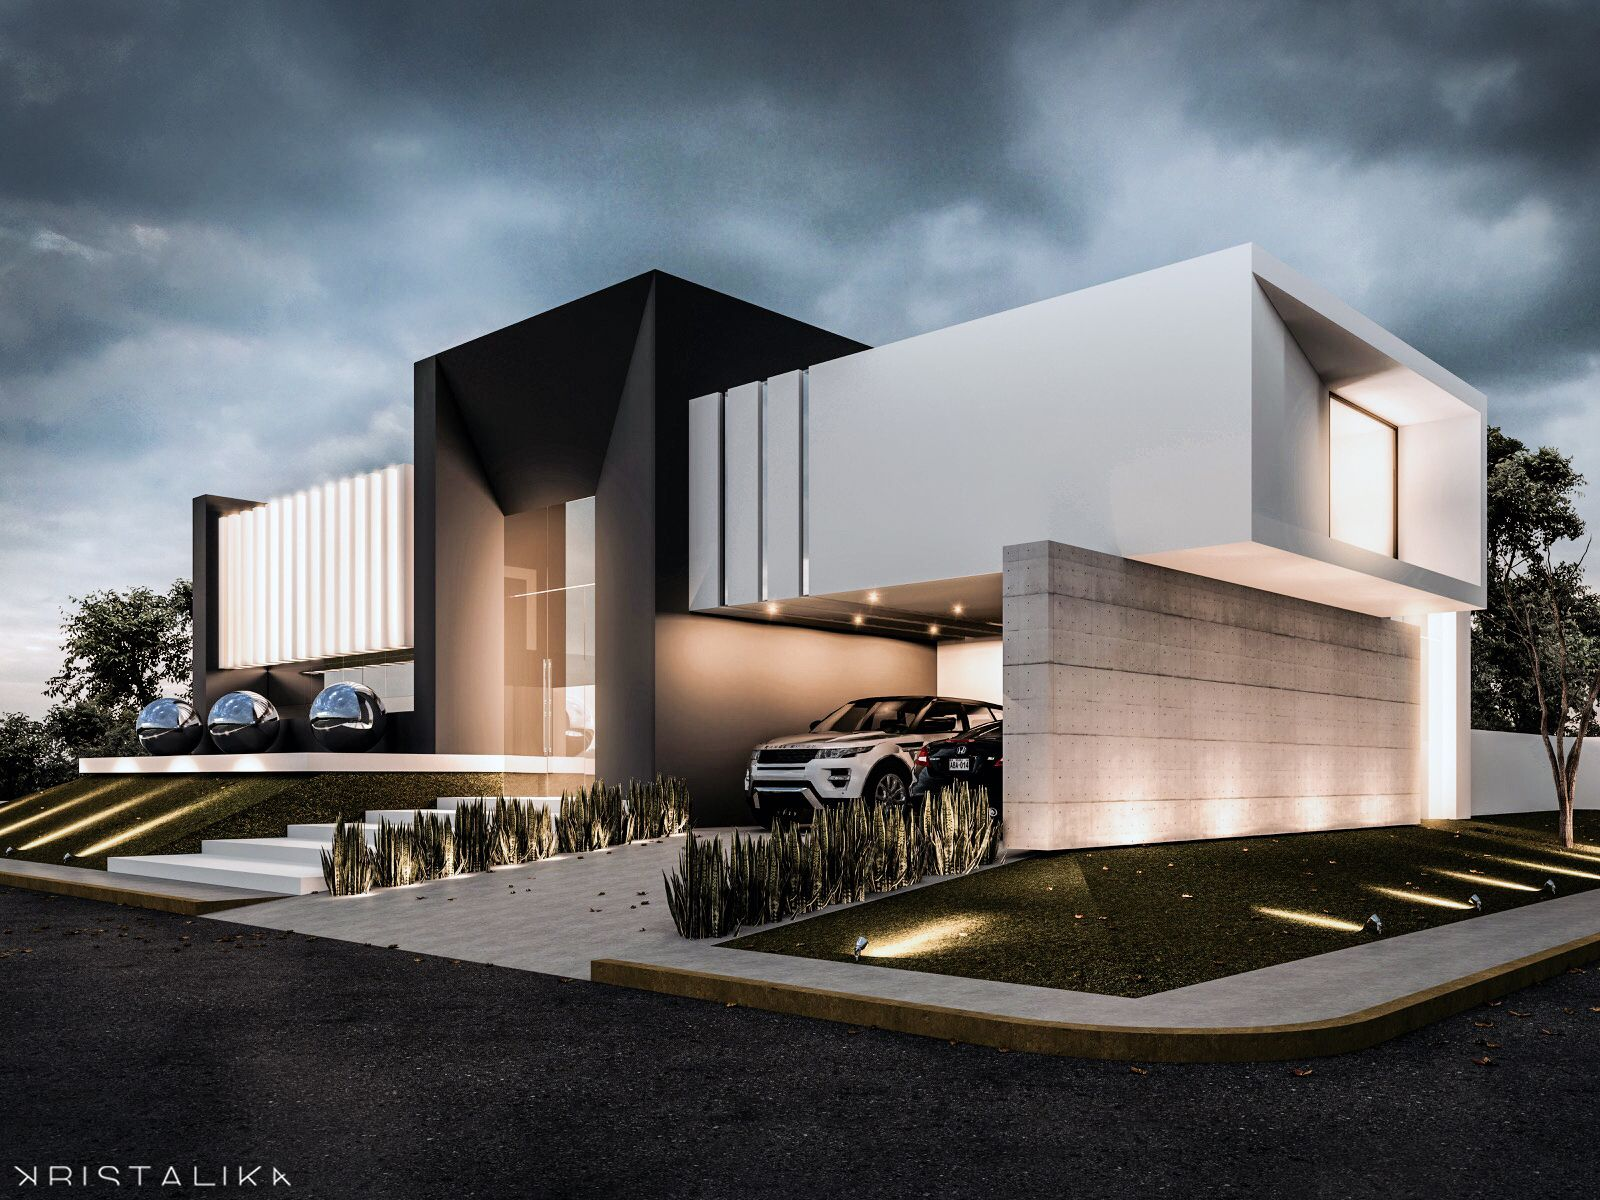 Contemporary House t house #architecture #modern #facade #contemporary #house #design